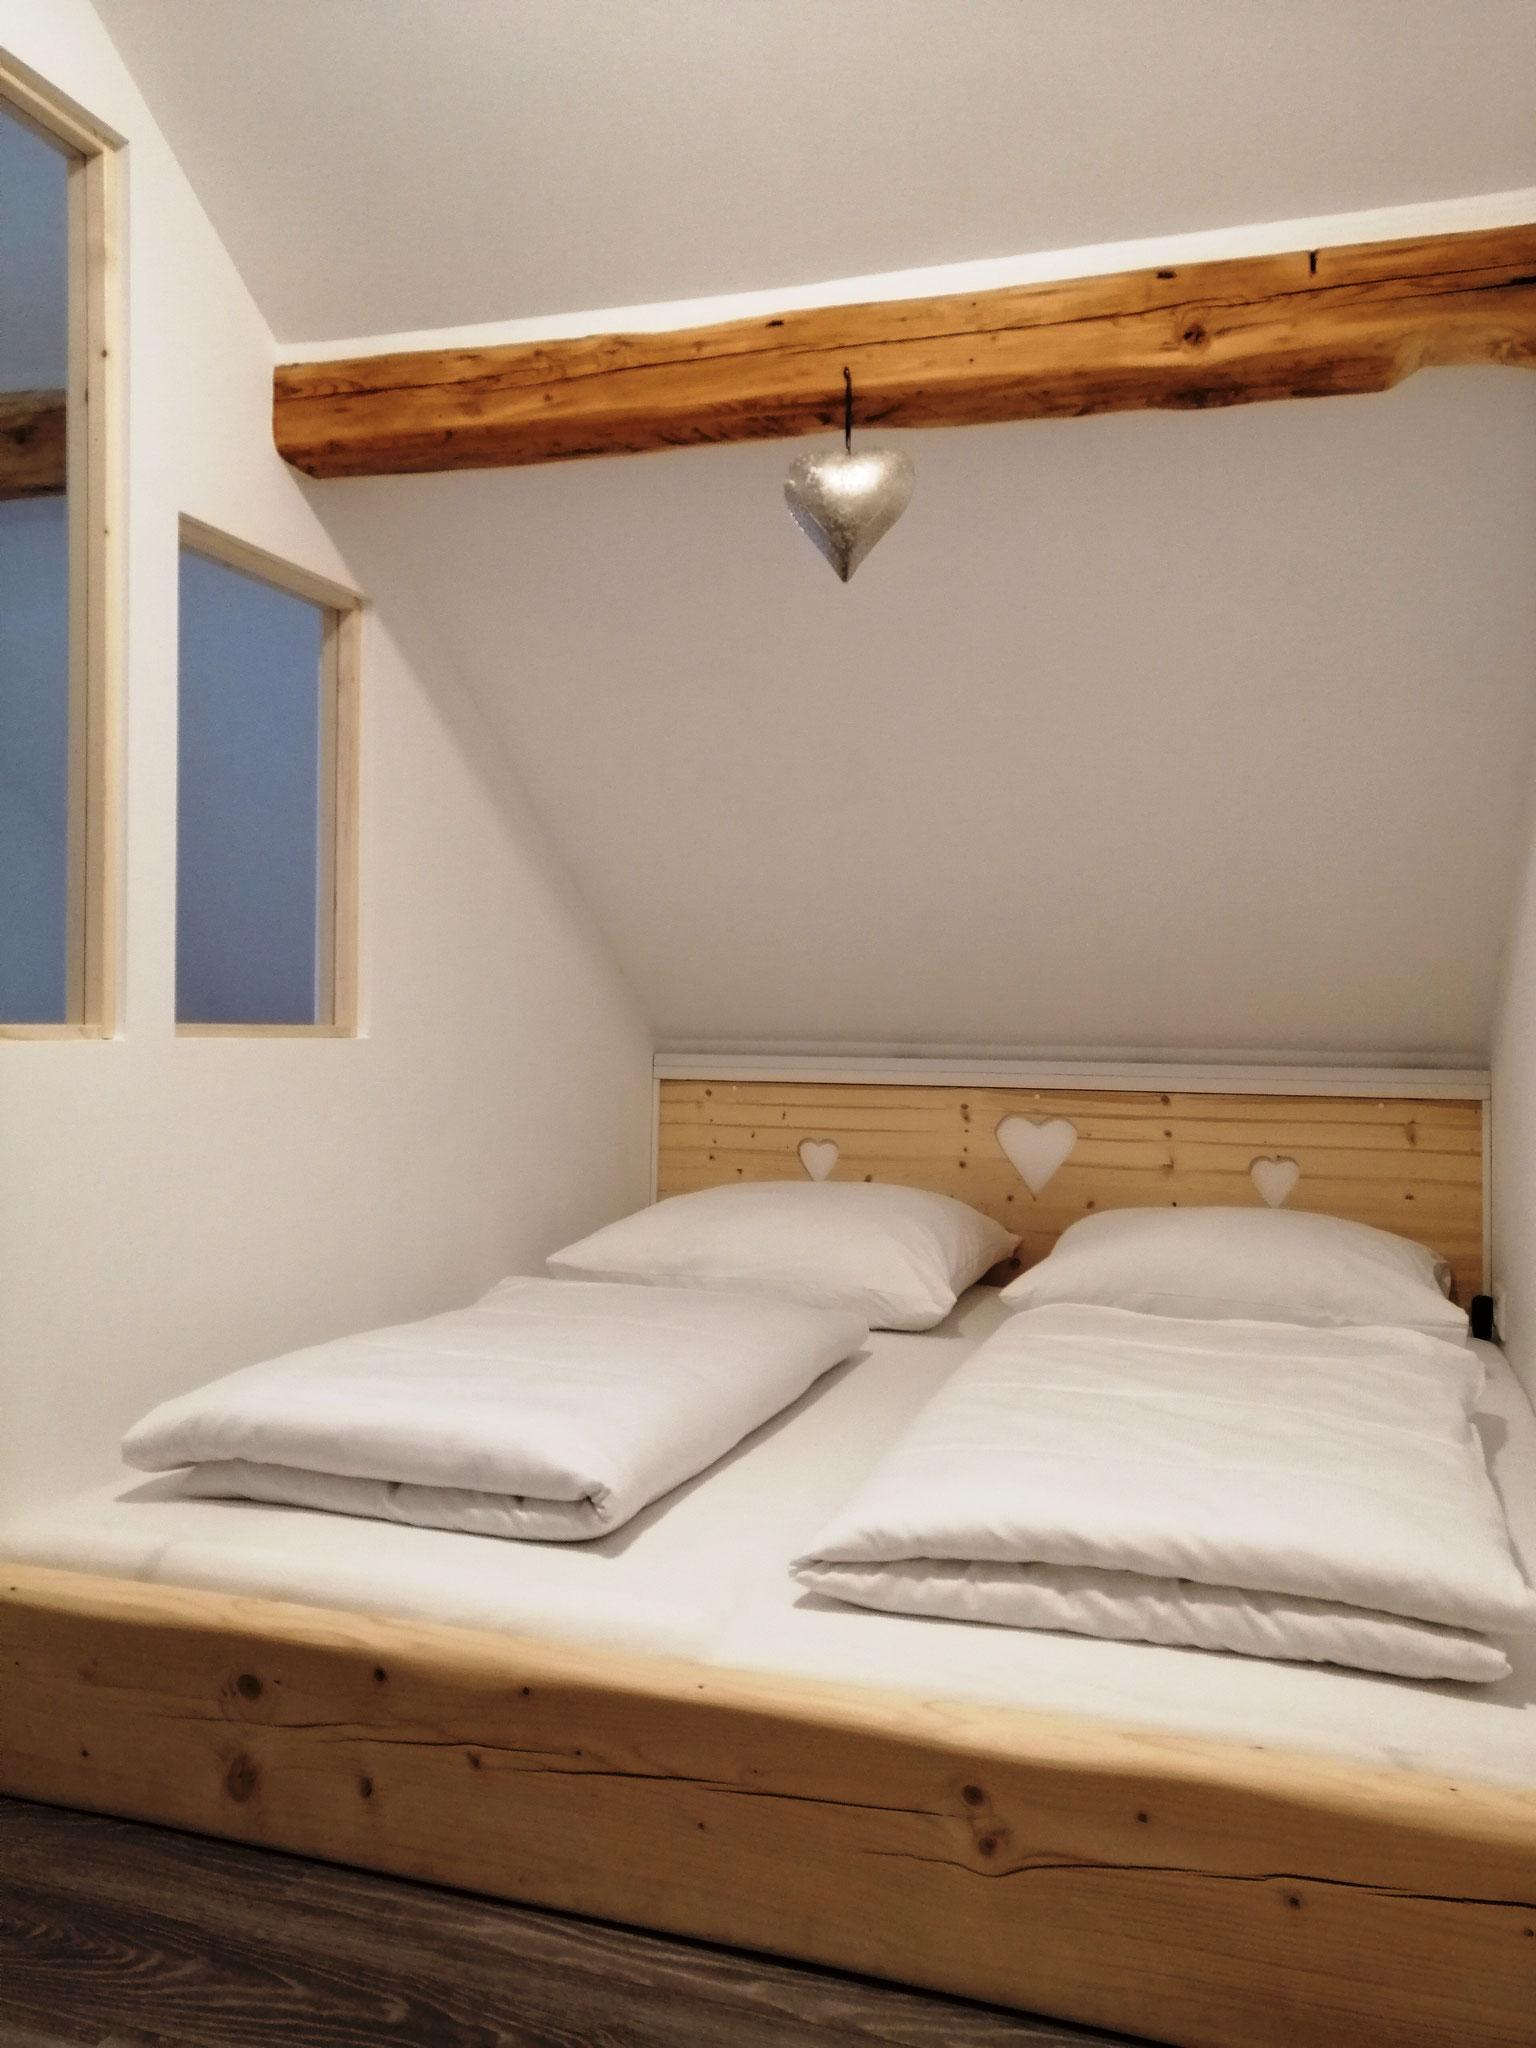 Doppelbett mit indirekter Beleuchtung ©KnallerbsenHof